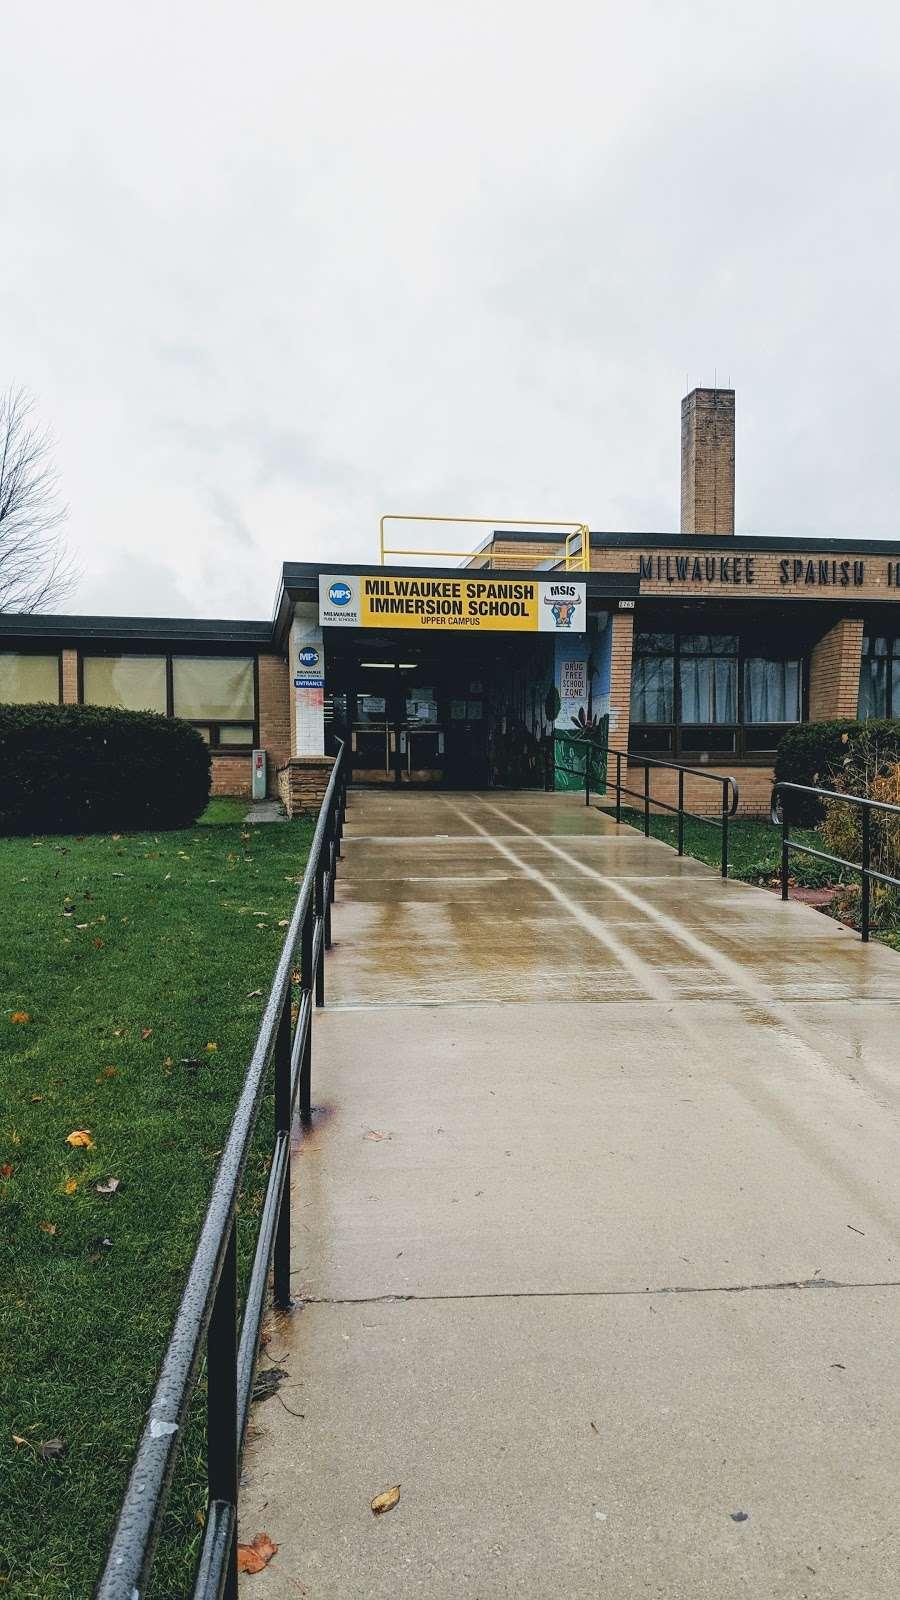 Milwaukee Spanish Immersion School - Upper Campus - school  | Photo 3 of 4 | Address: 2765 S 55th St, Milwaukee, WI 53219, USA | Phone: (414) 604-7600